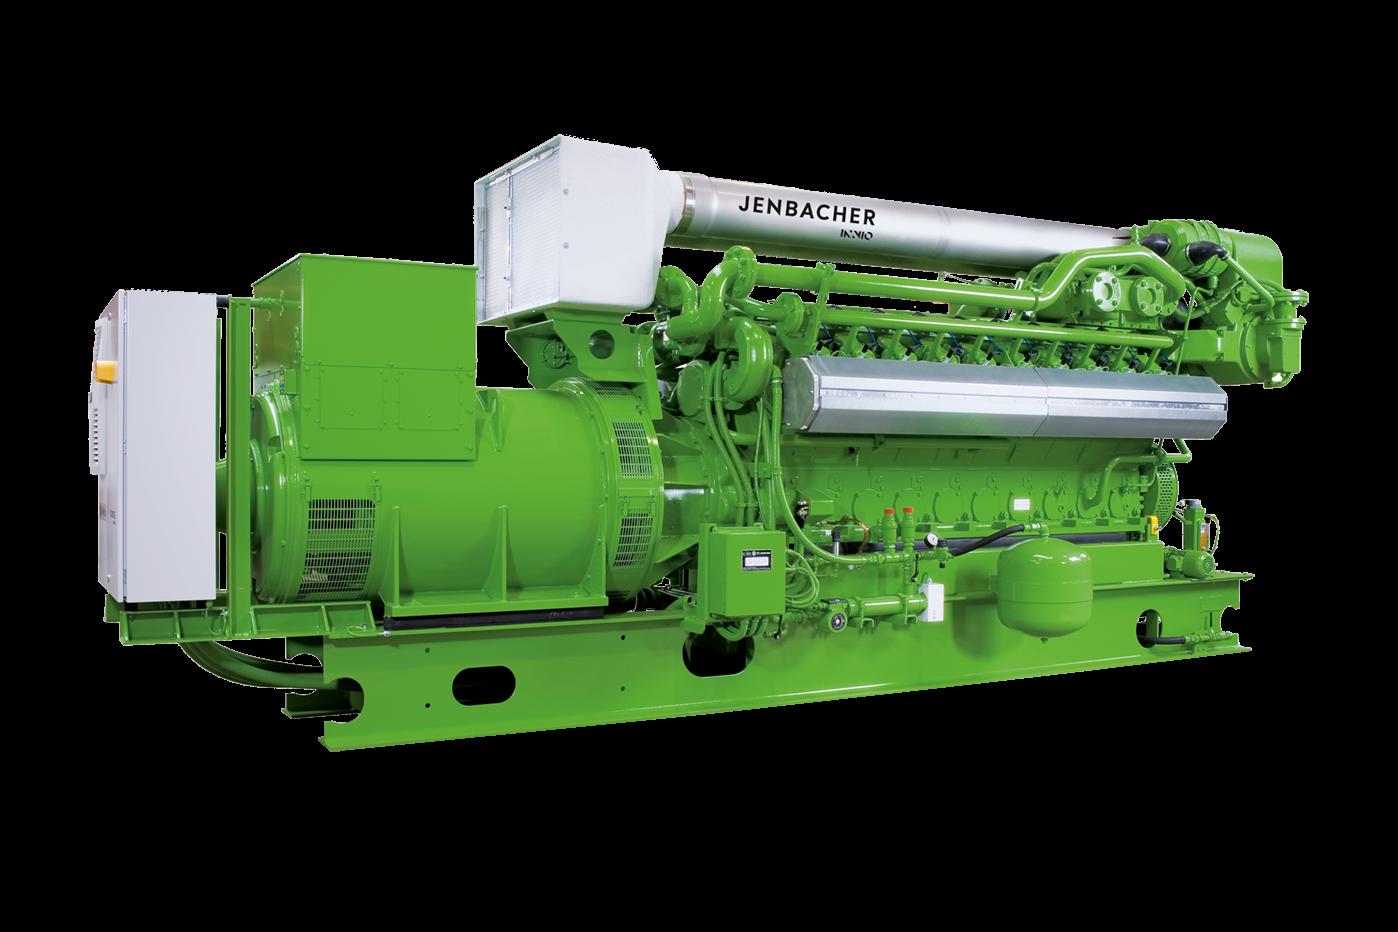 Газопоршневая установка Jenbacher 320